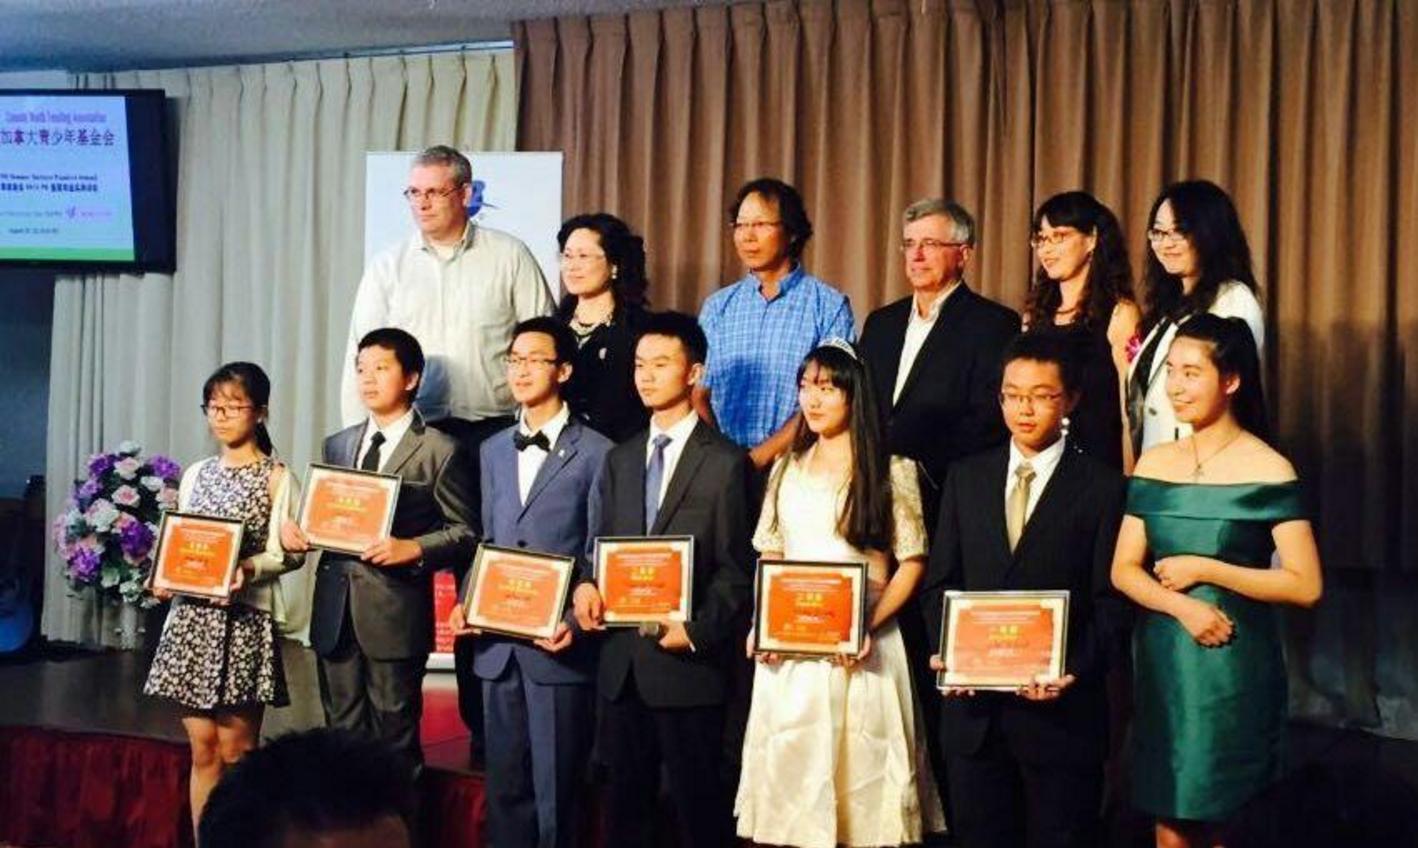 PEI 2016 CYFA Summer Business Practice Summit Awards Banquet